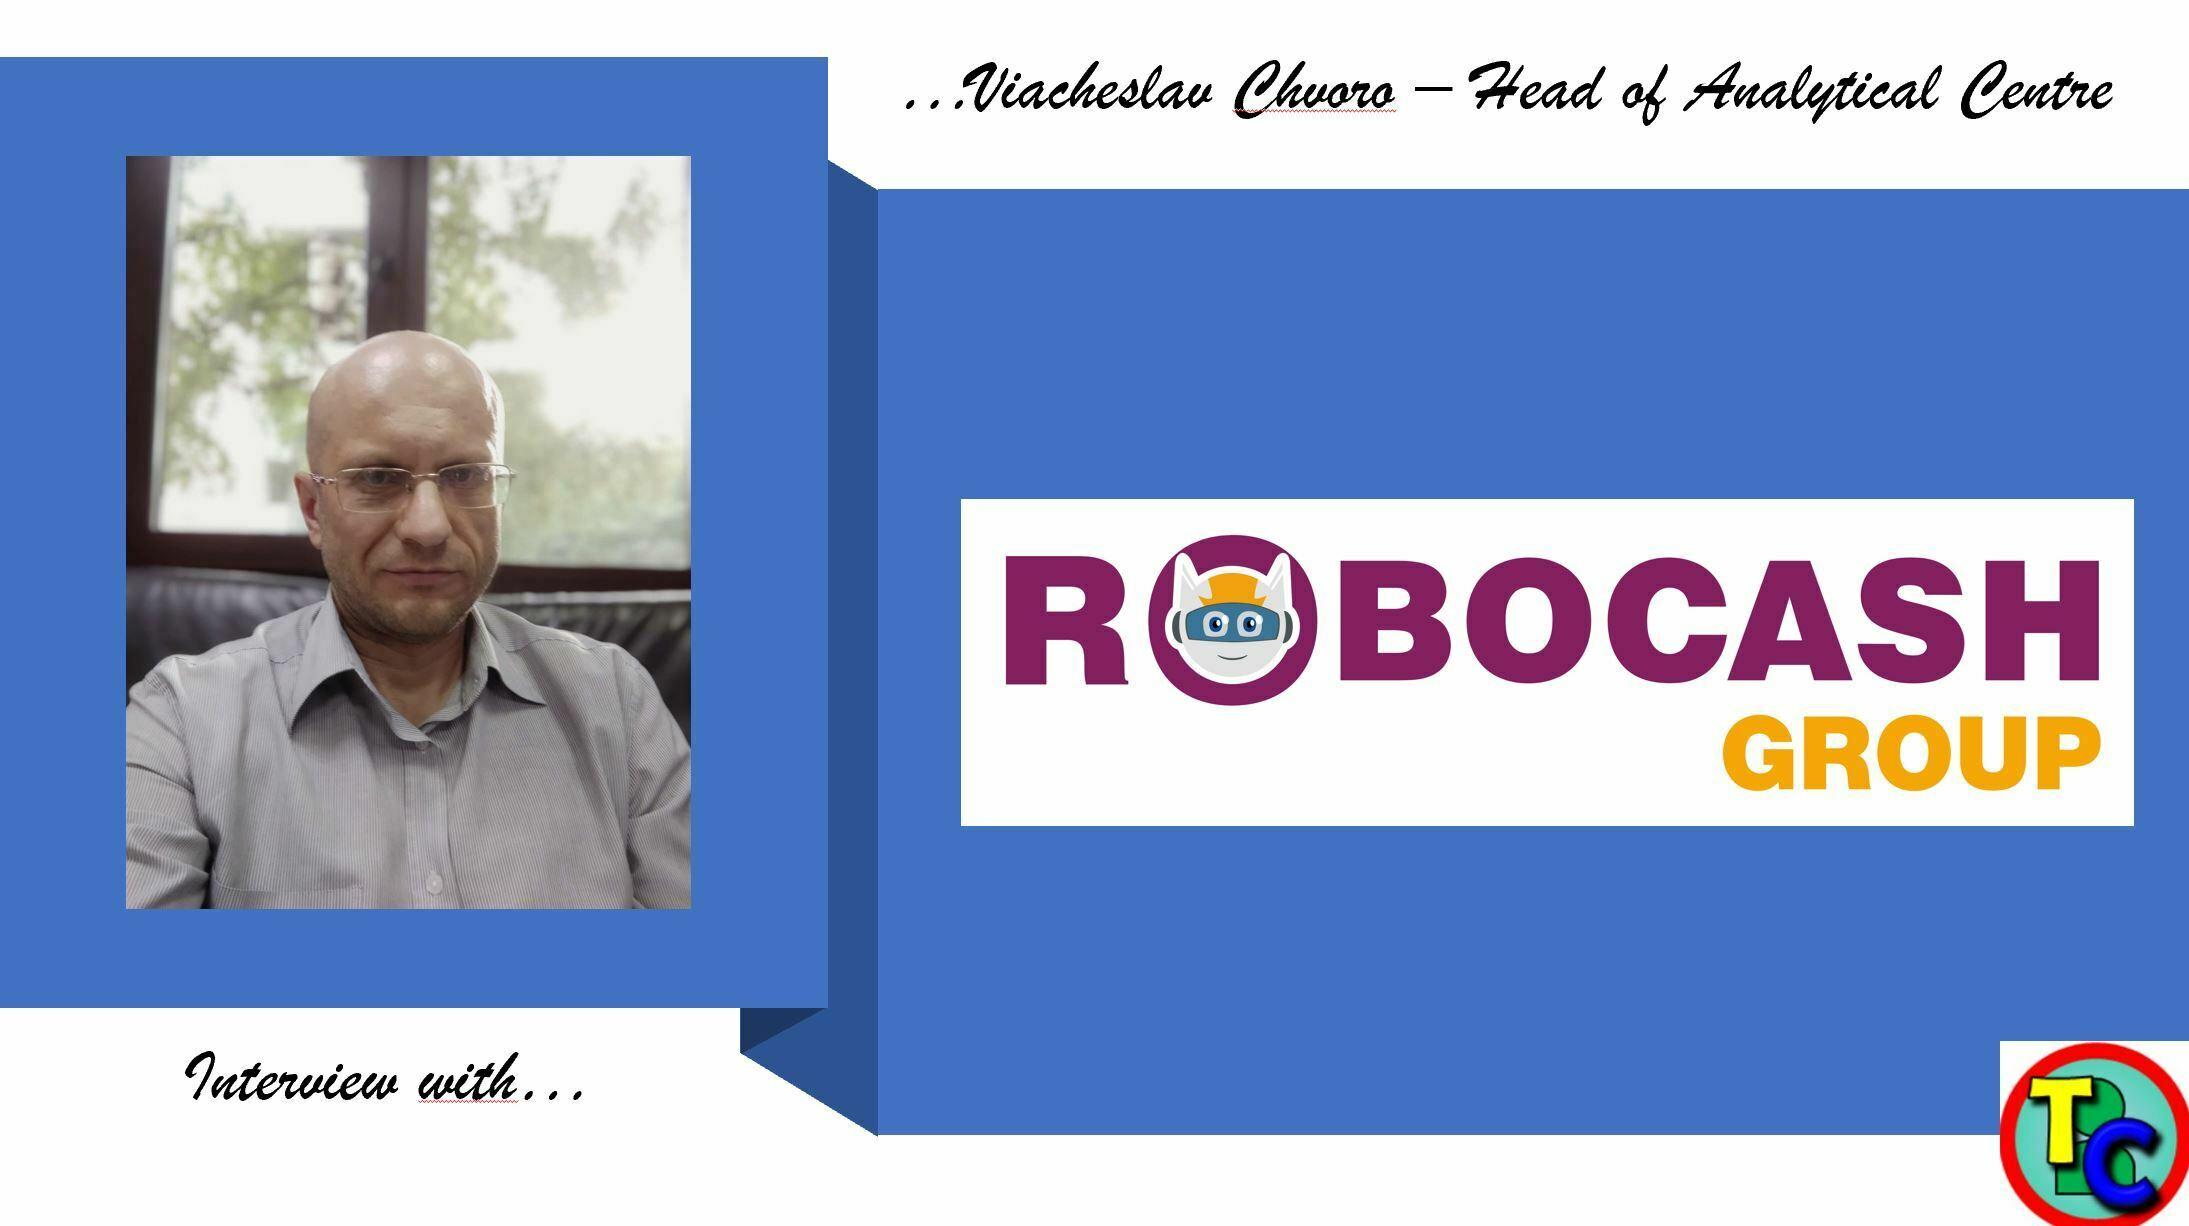 Viacheslav Chvoro – Head of the Analytical Centre robo.cash – Interview 2021